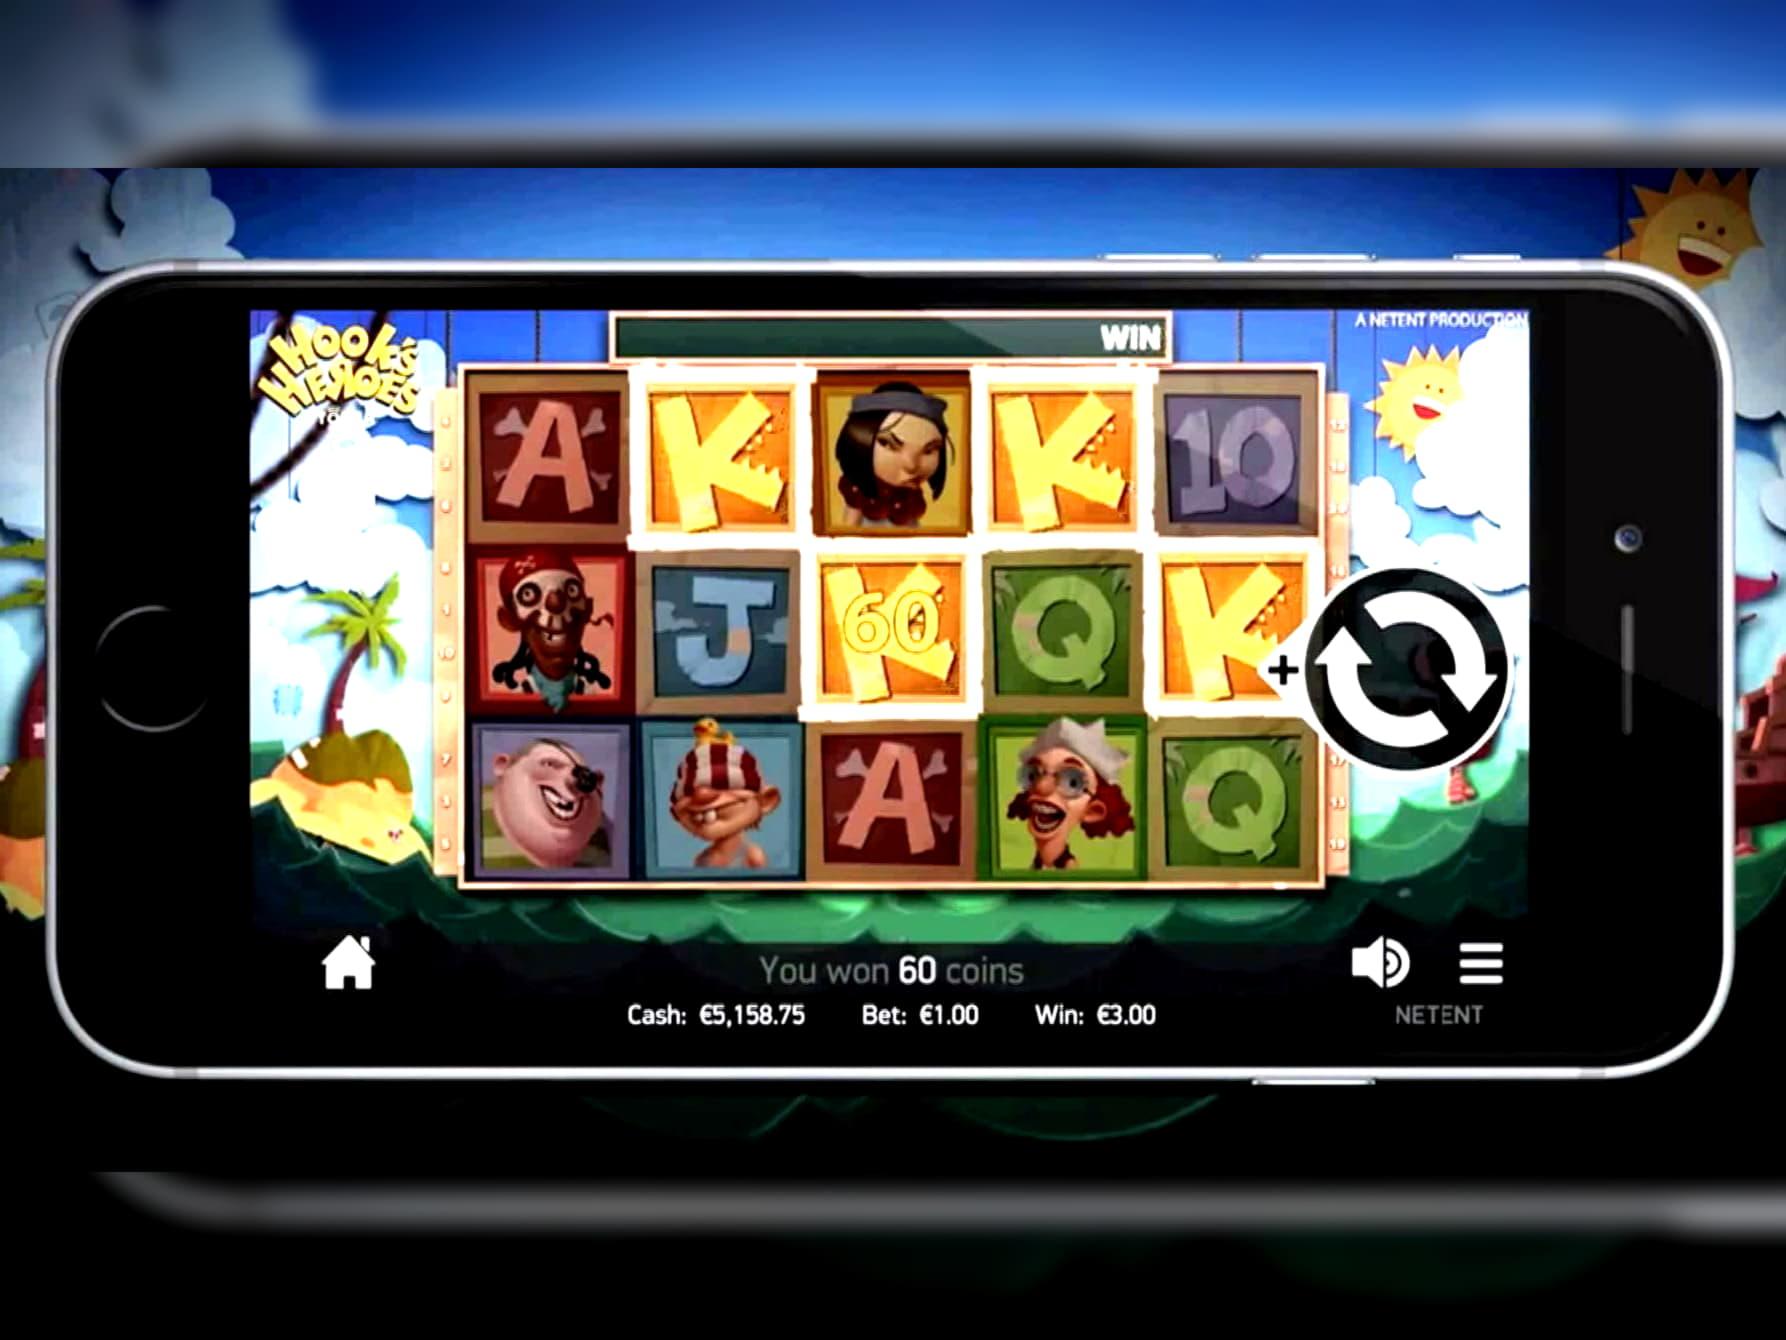 80% Deposit match bonus at Boa Boa Casino